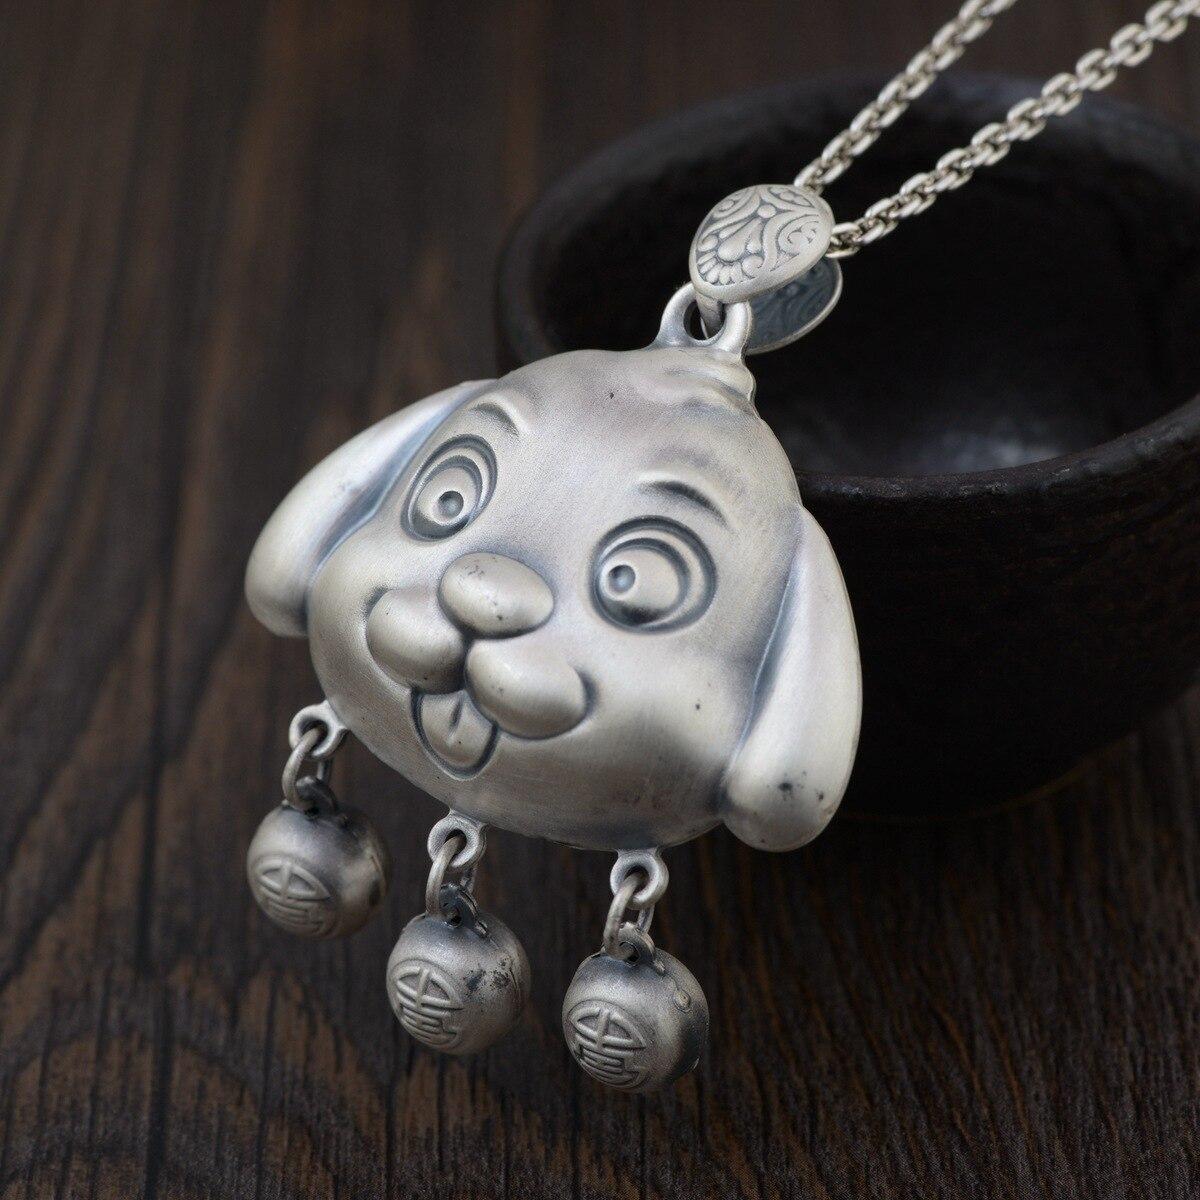 990 silver pendant zodiac dog Fine silver jewelry wholesale Benmingnian accessories products990 silver pendant zodiac dog Fine silver jewelry wholesale Benmingnian accessories products